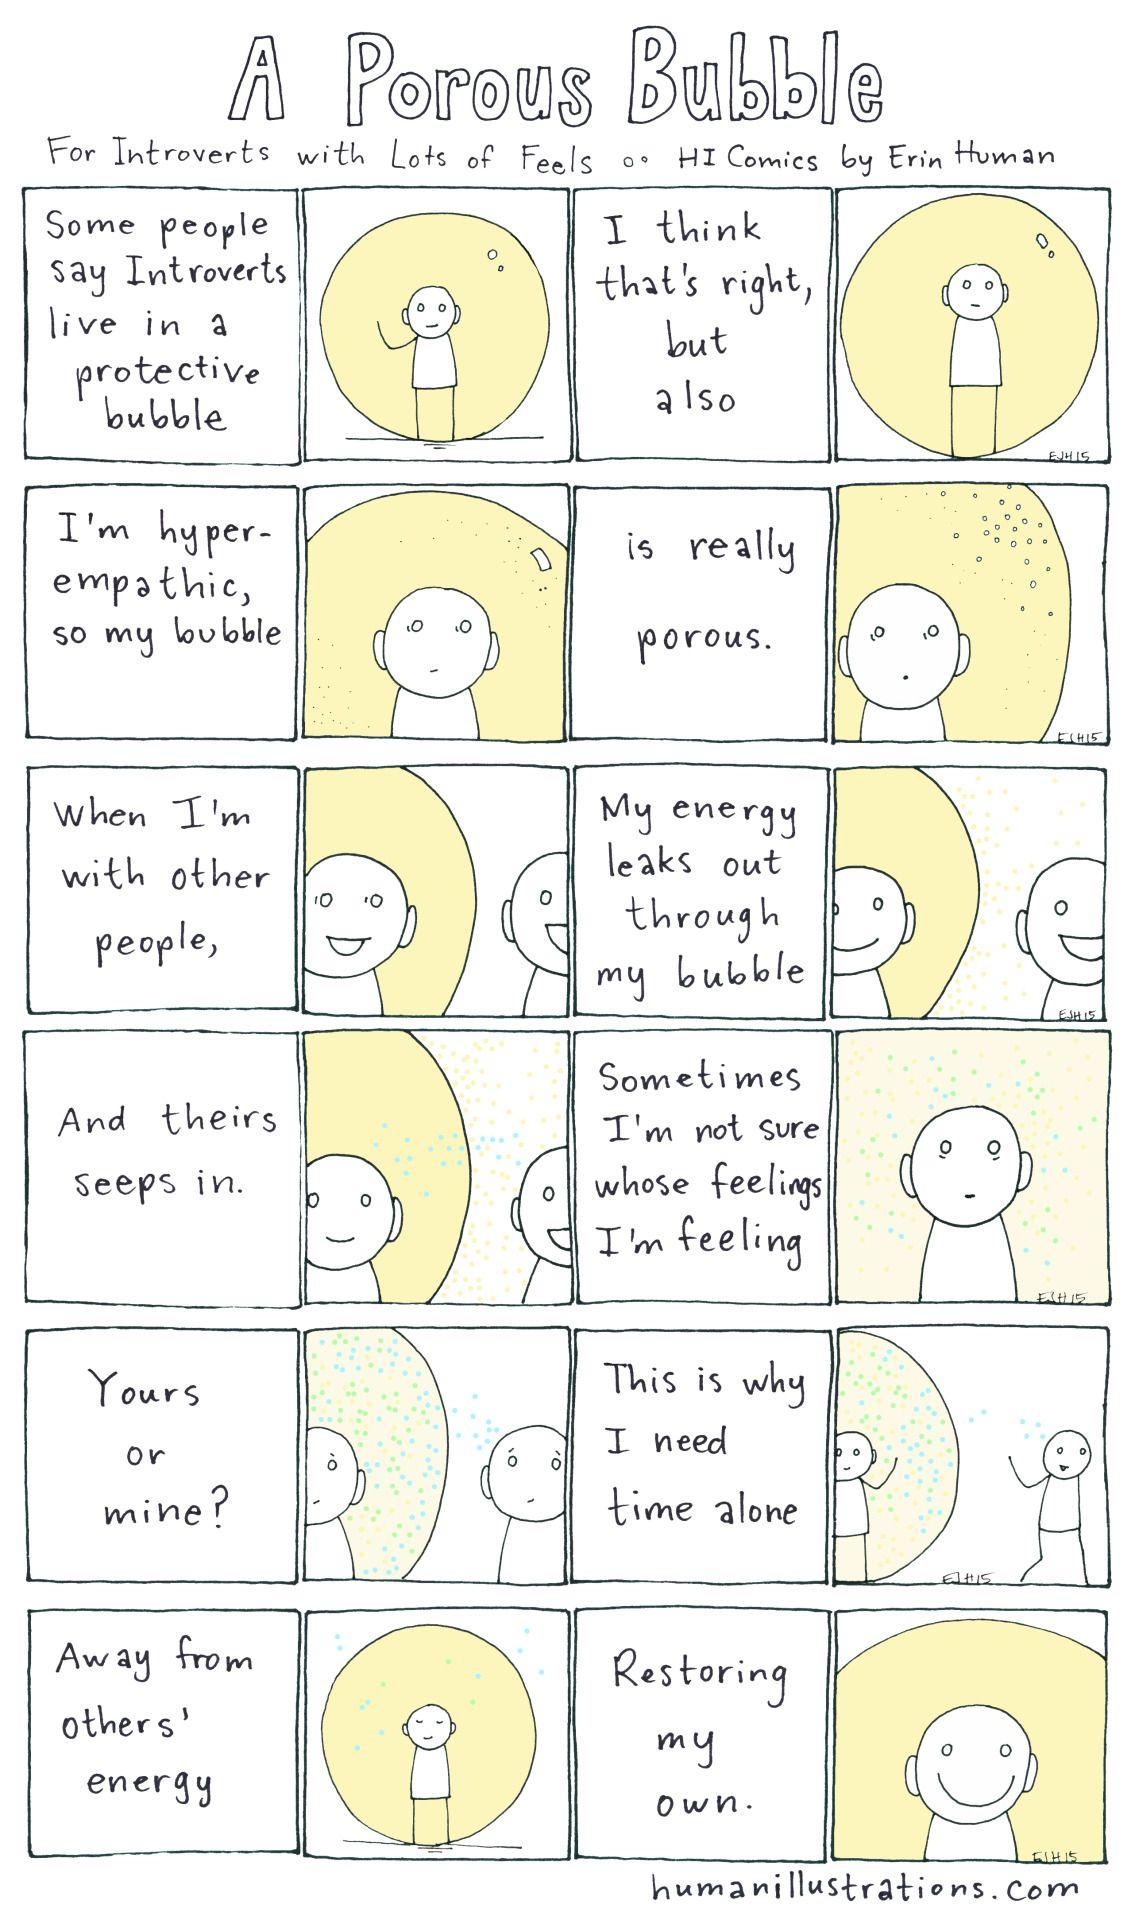 Empaths & Highly Sensitive People (HSP) •~• A Porous Bubble